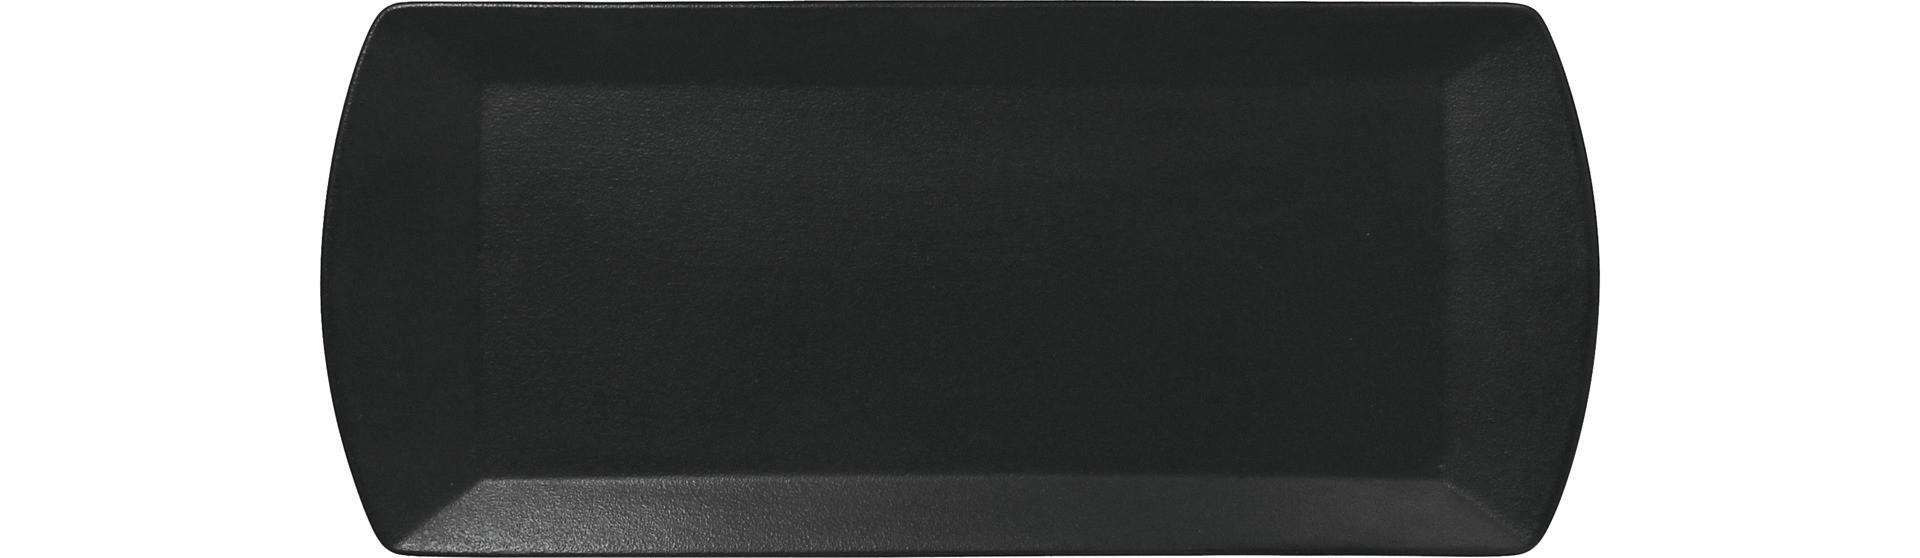 Neofusion, Sandwichplatte 350 x 150 mm volcano